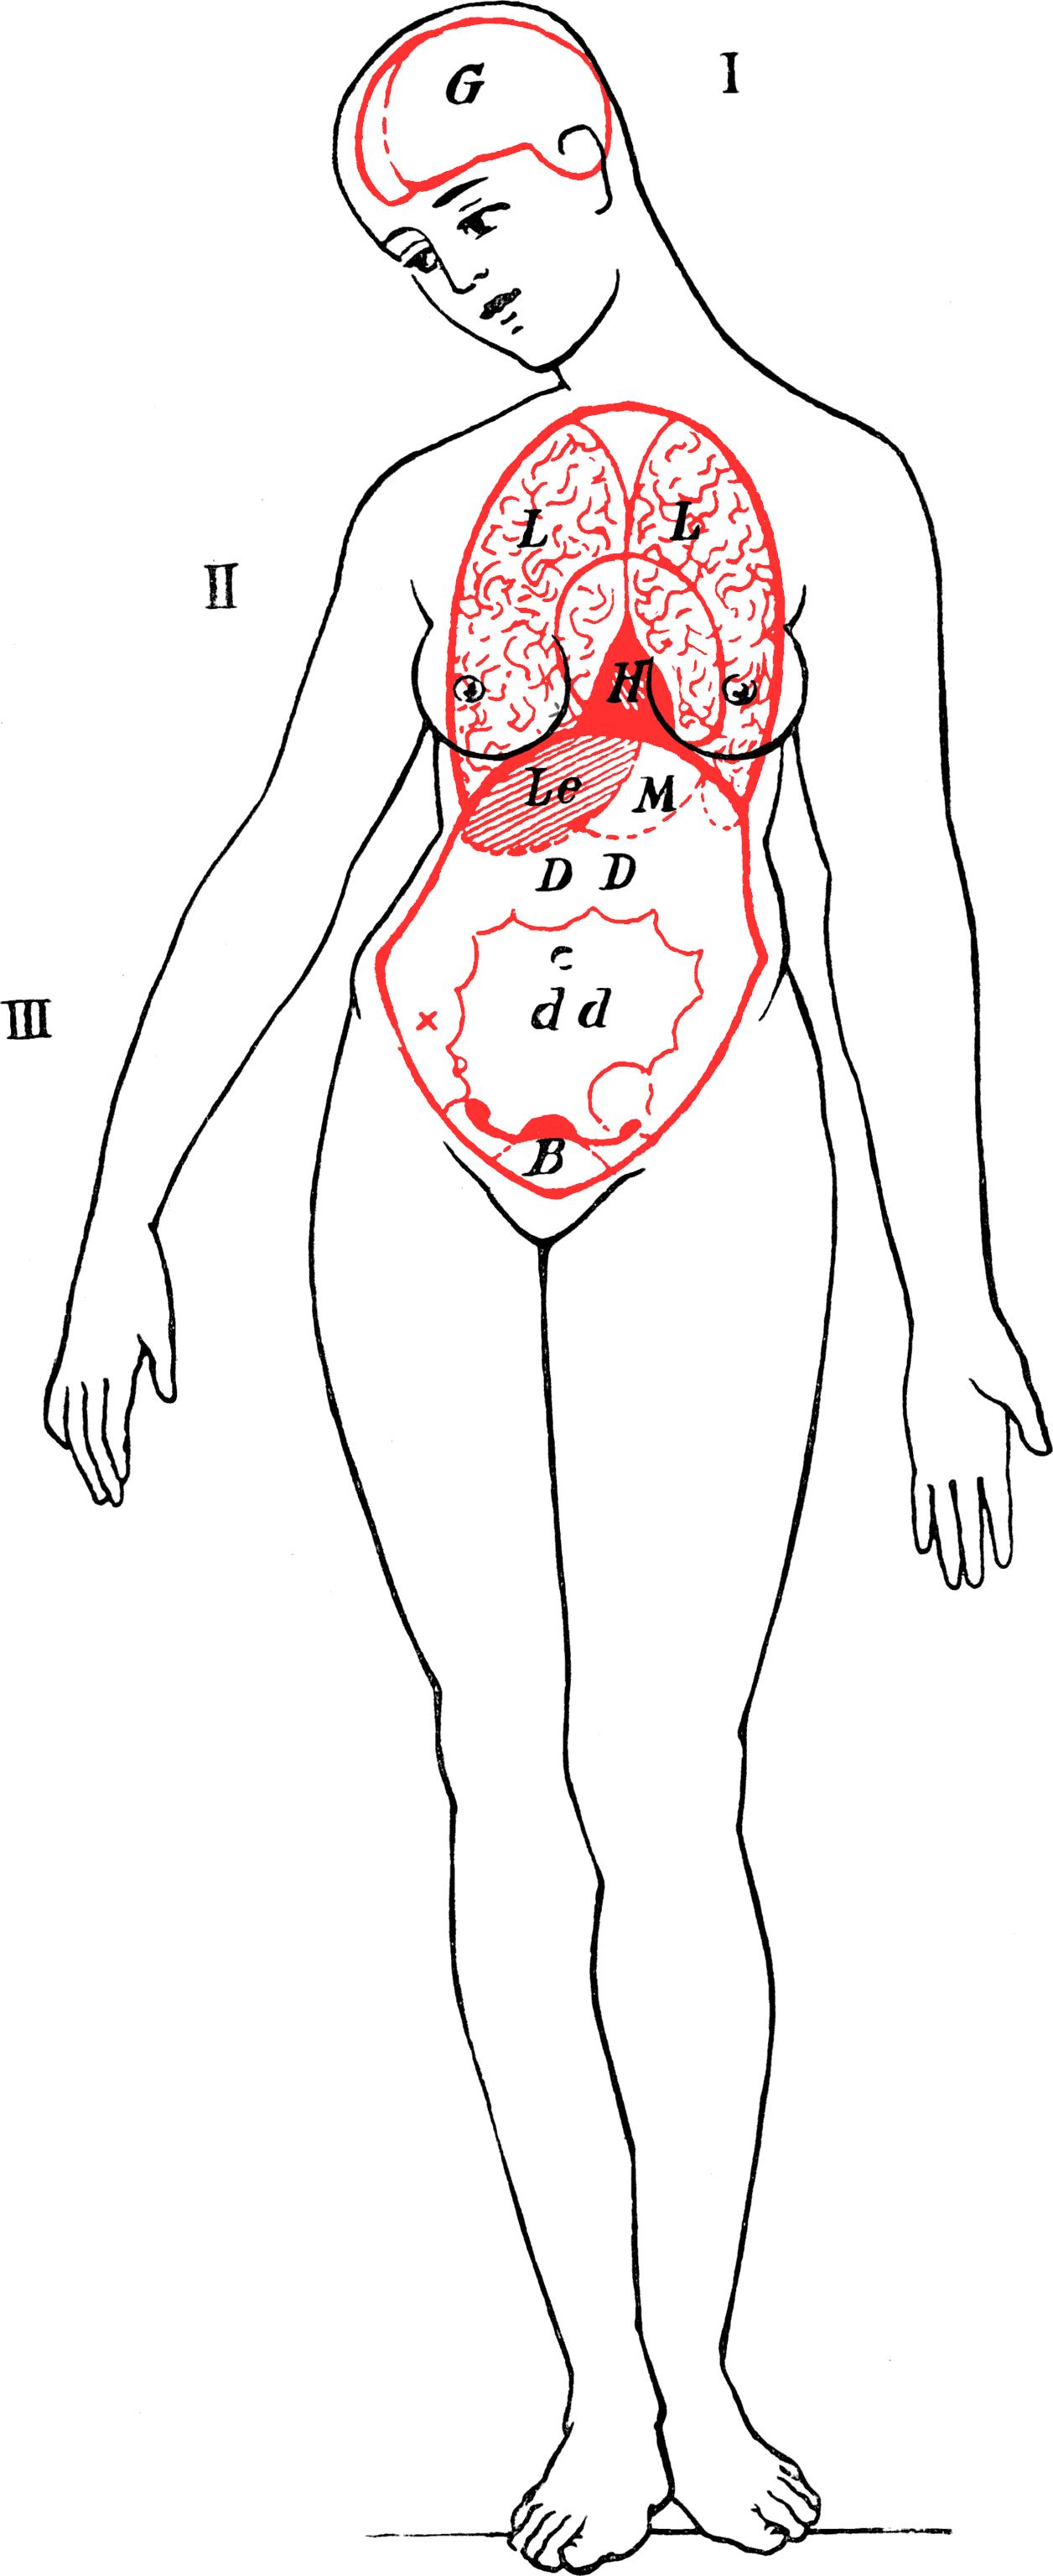 File:Die innerenOrgane undKorperhohlen desWeibes.png - Wikimedia Commons